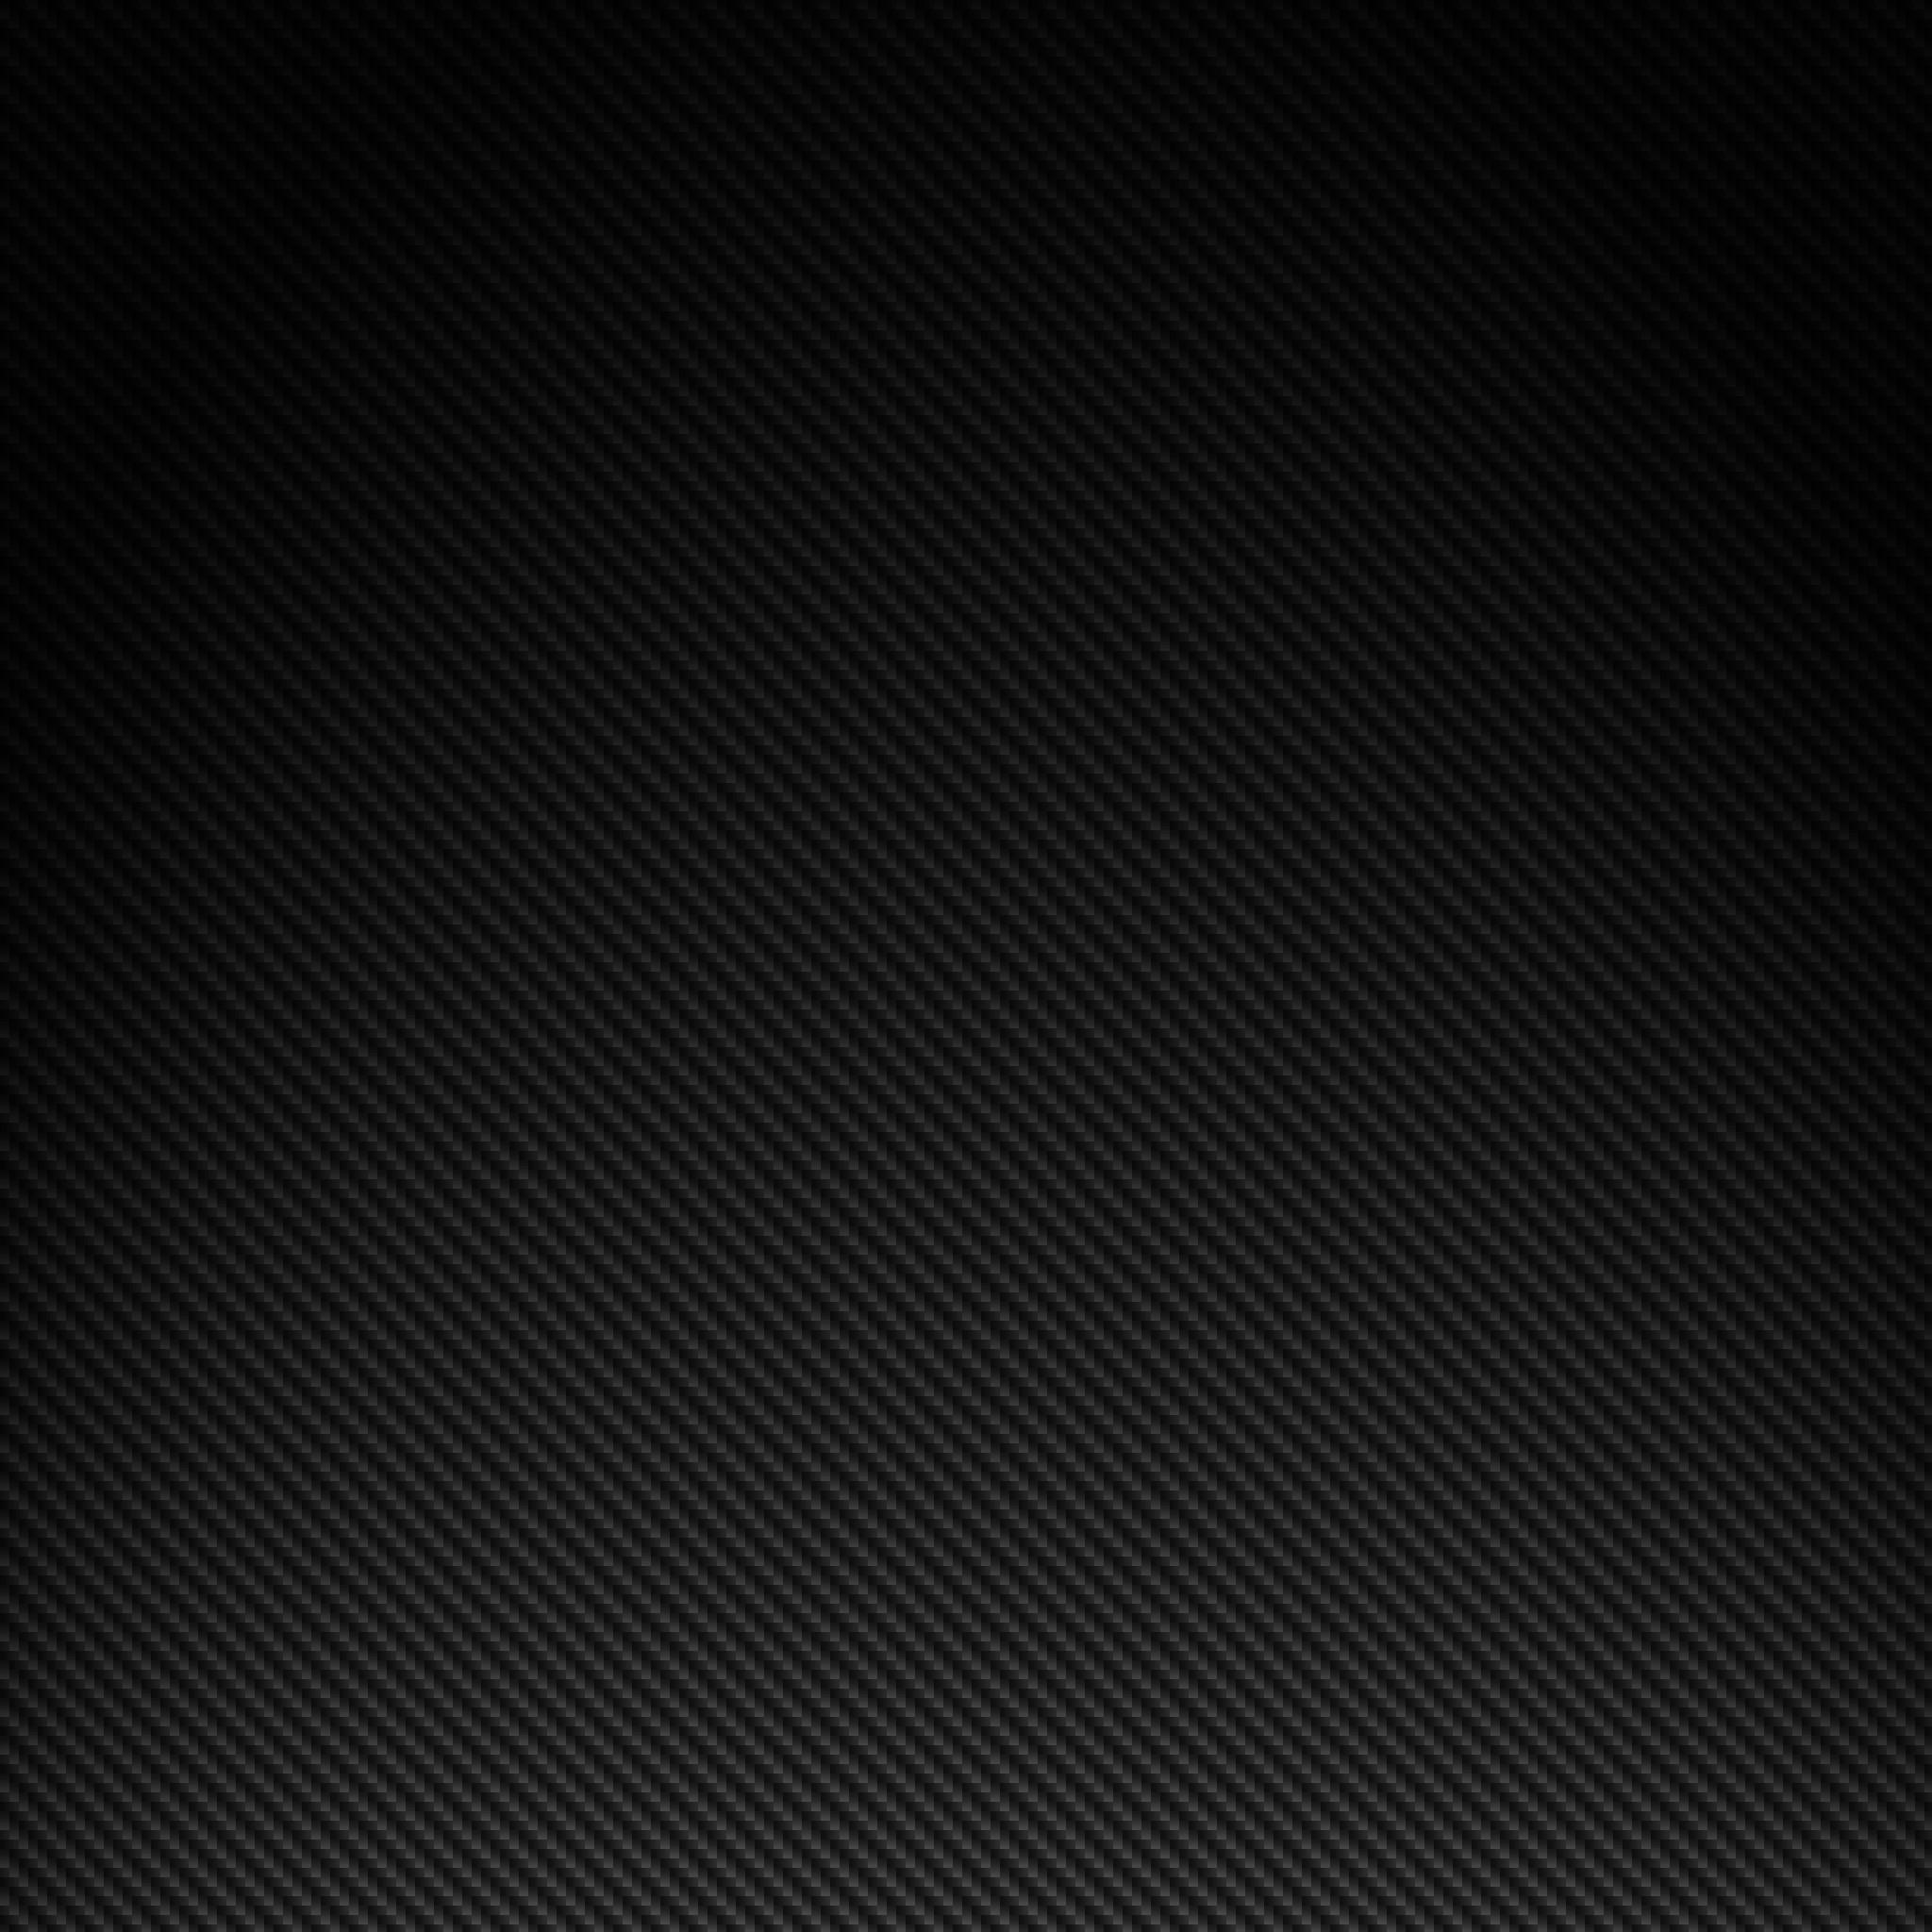 carbon fiber wallpaper windows 7 (58+ images)